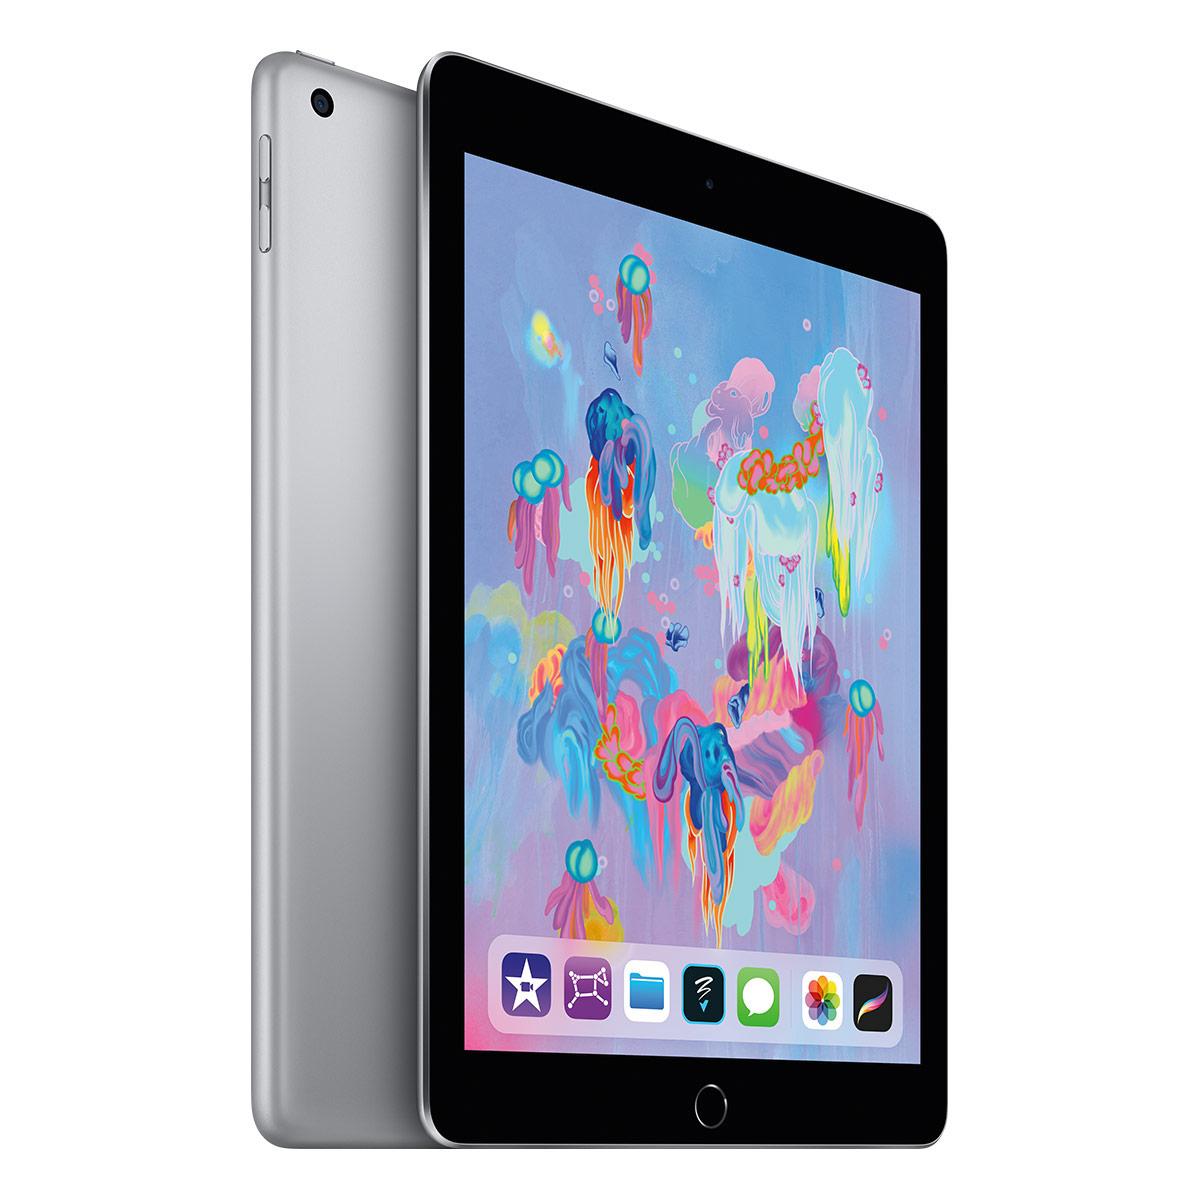 Education Apple iPad 128GB WiFi - Space Grey